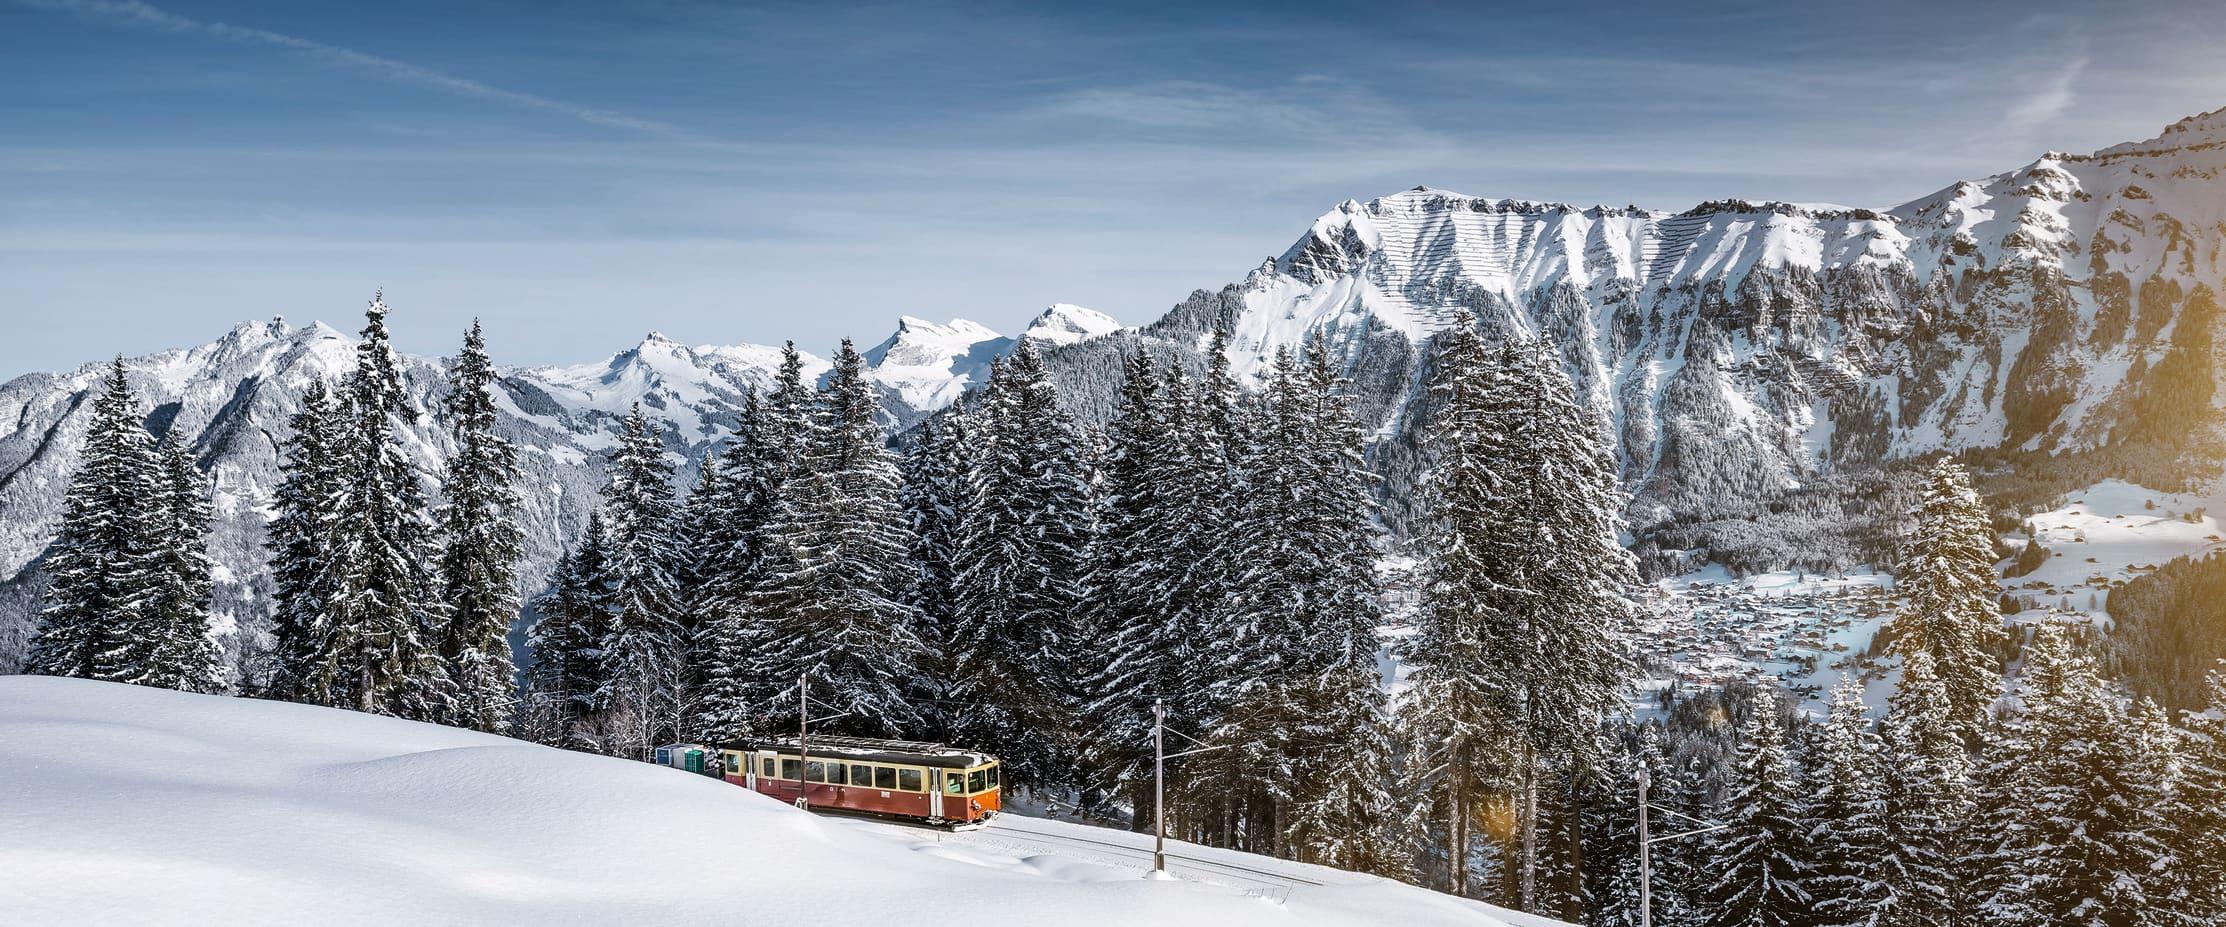 Jungfrau BLM bergbahn lauterbrunnen muerren